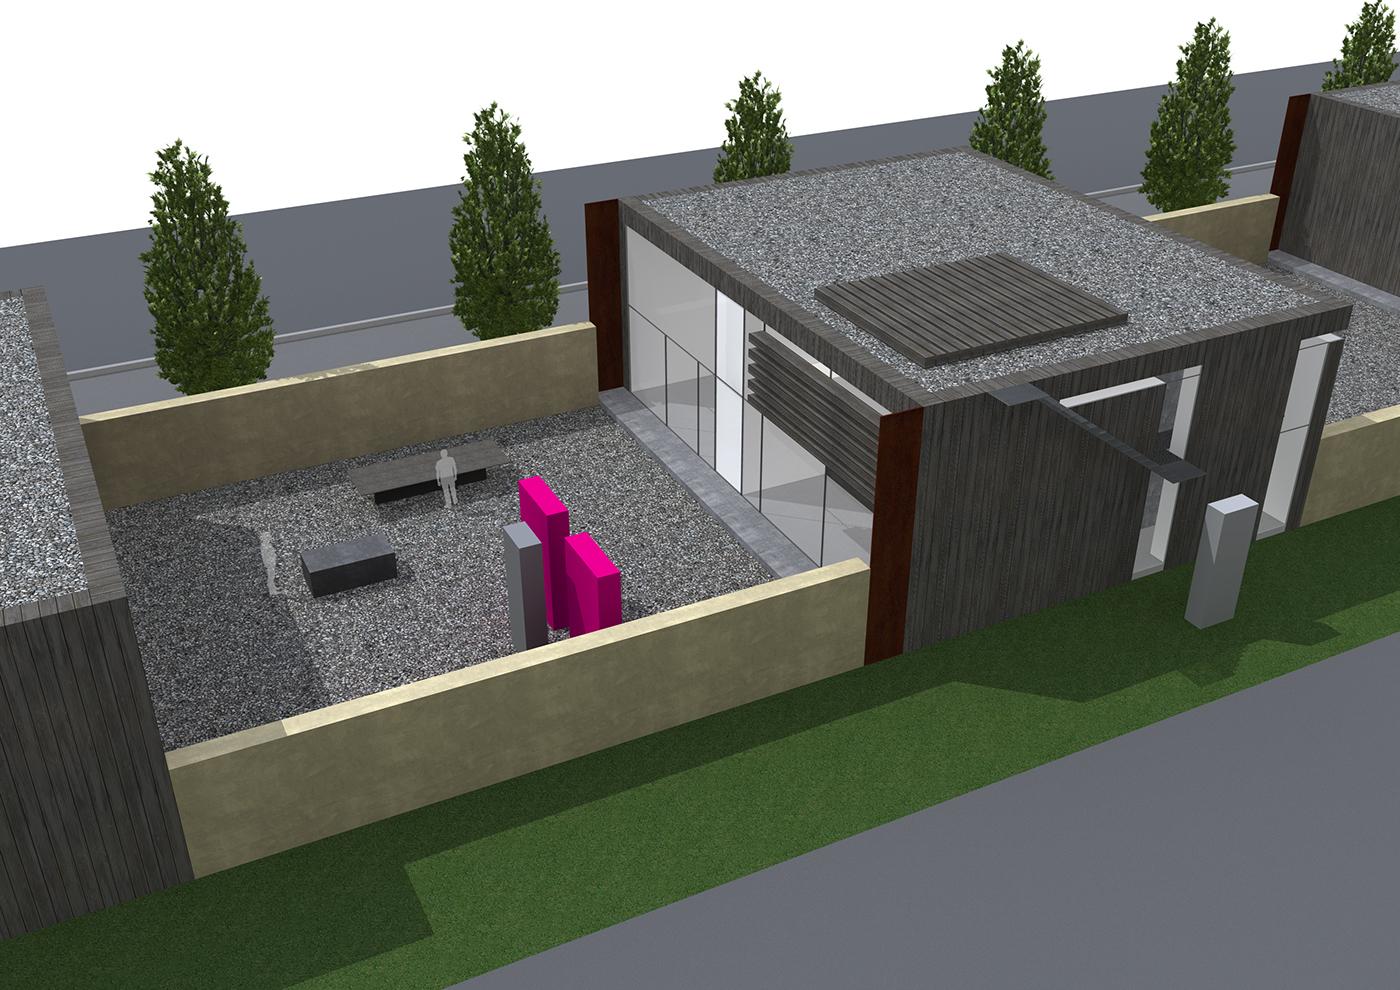 Atelier delemont on behance for B architecture delemont